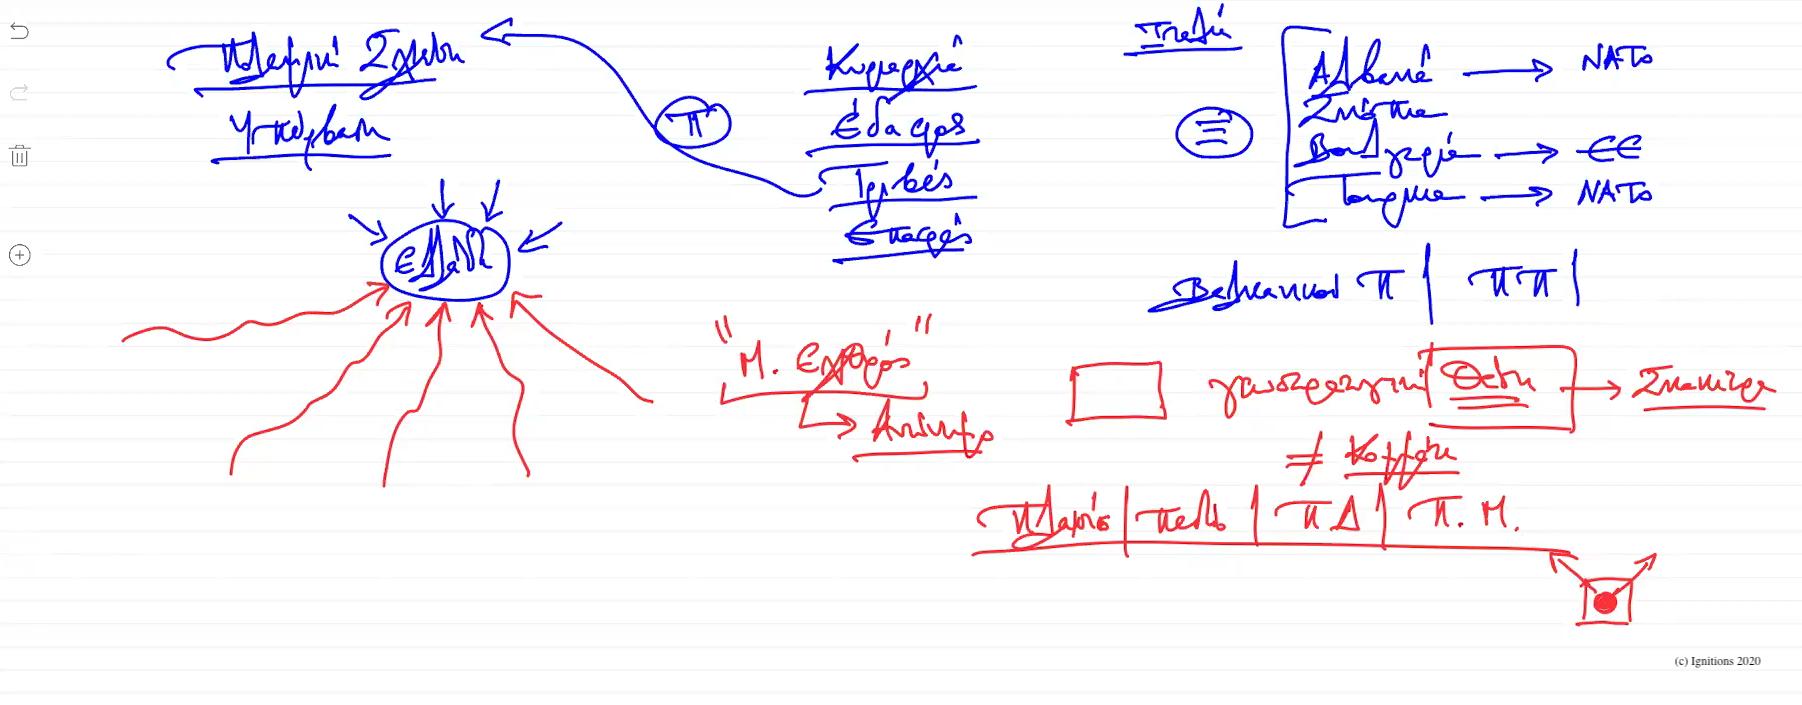 56022 - XII - e-Διάλεξη: Ελληνική Γεωστρατηγική I. (Dessin)